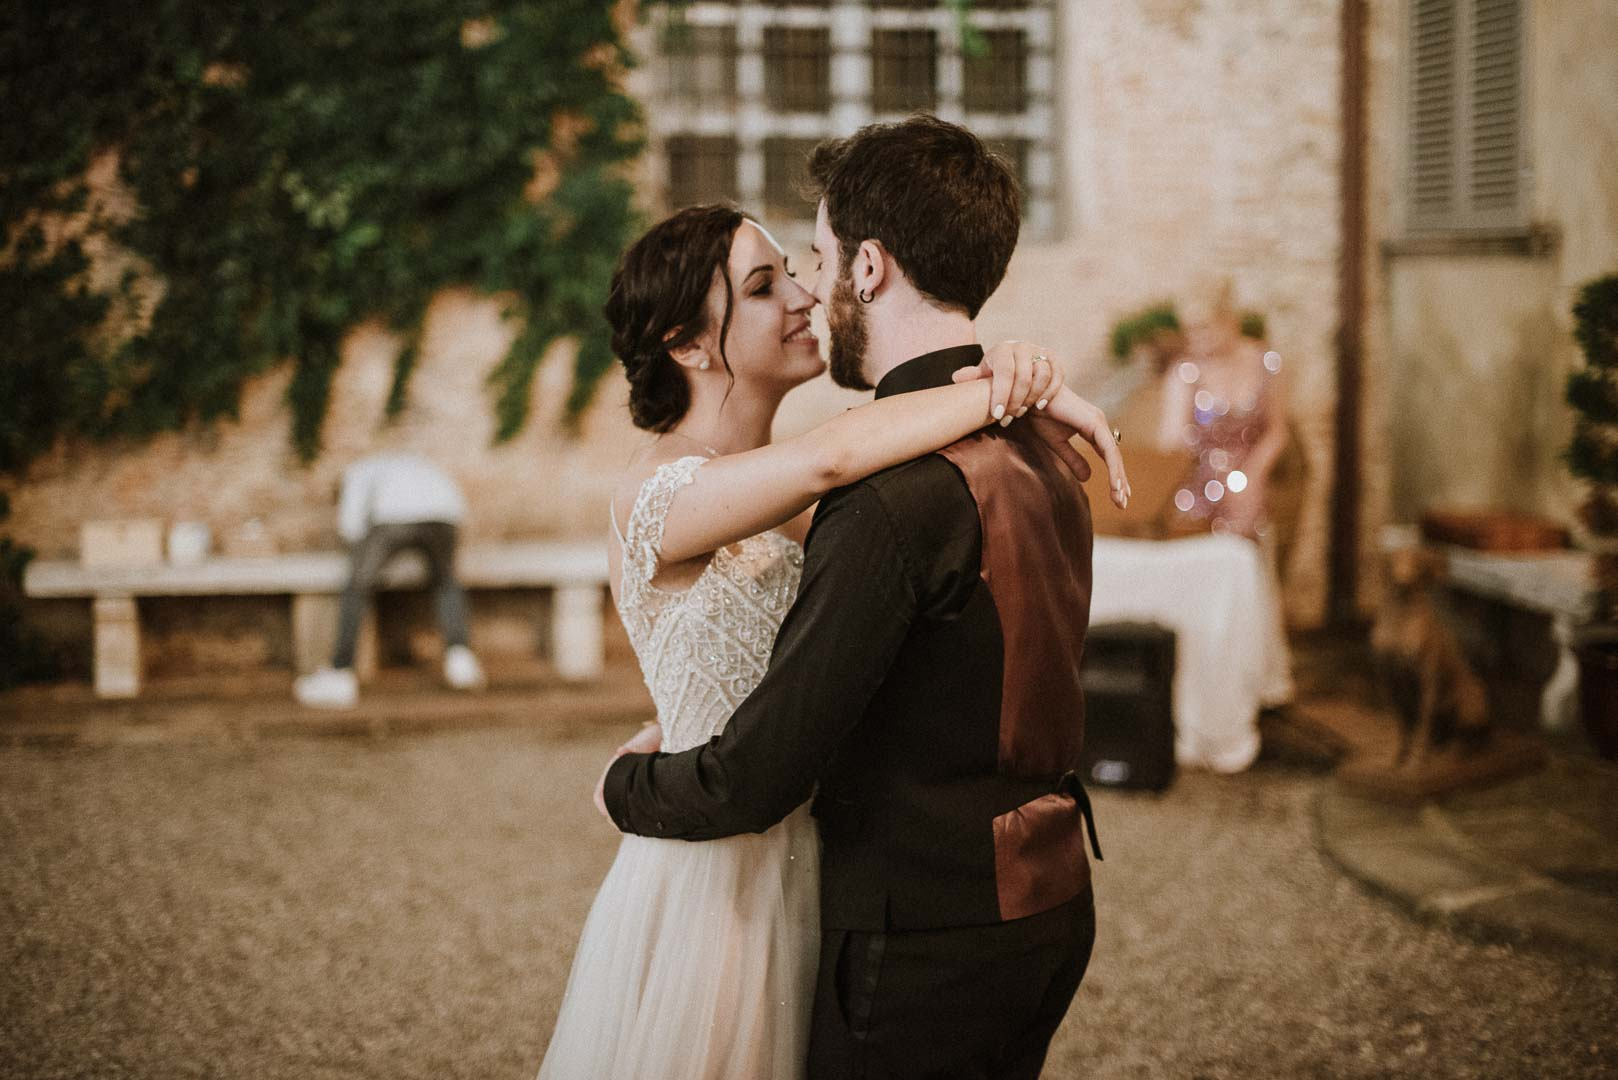 wedding-photographer-destination-fineart-bespoke-reportage-tuscany-villascorzi-vivianeizzo-spazio46-179